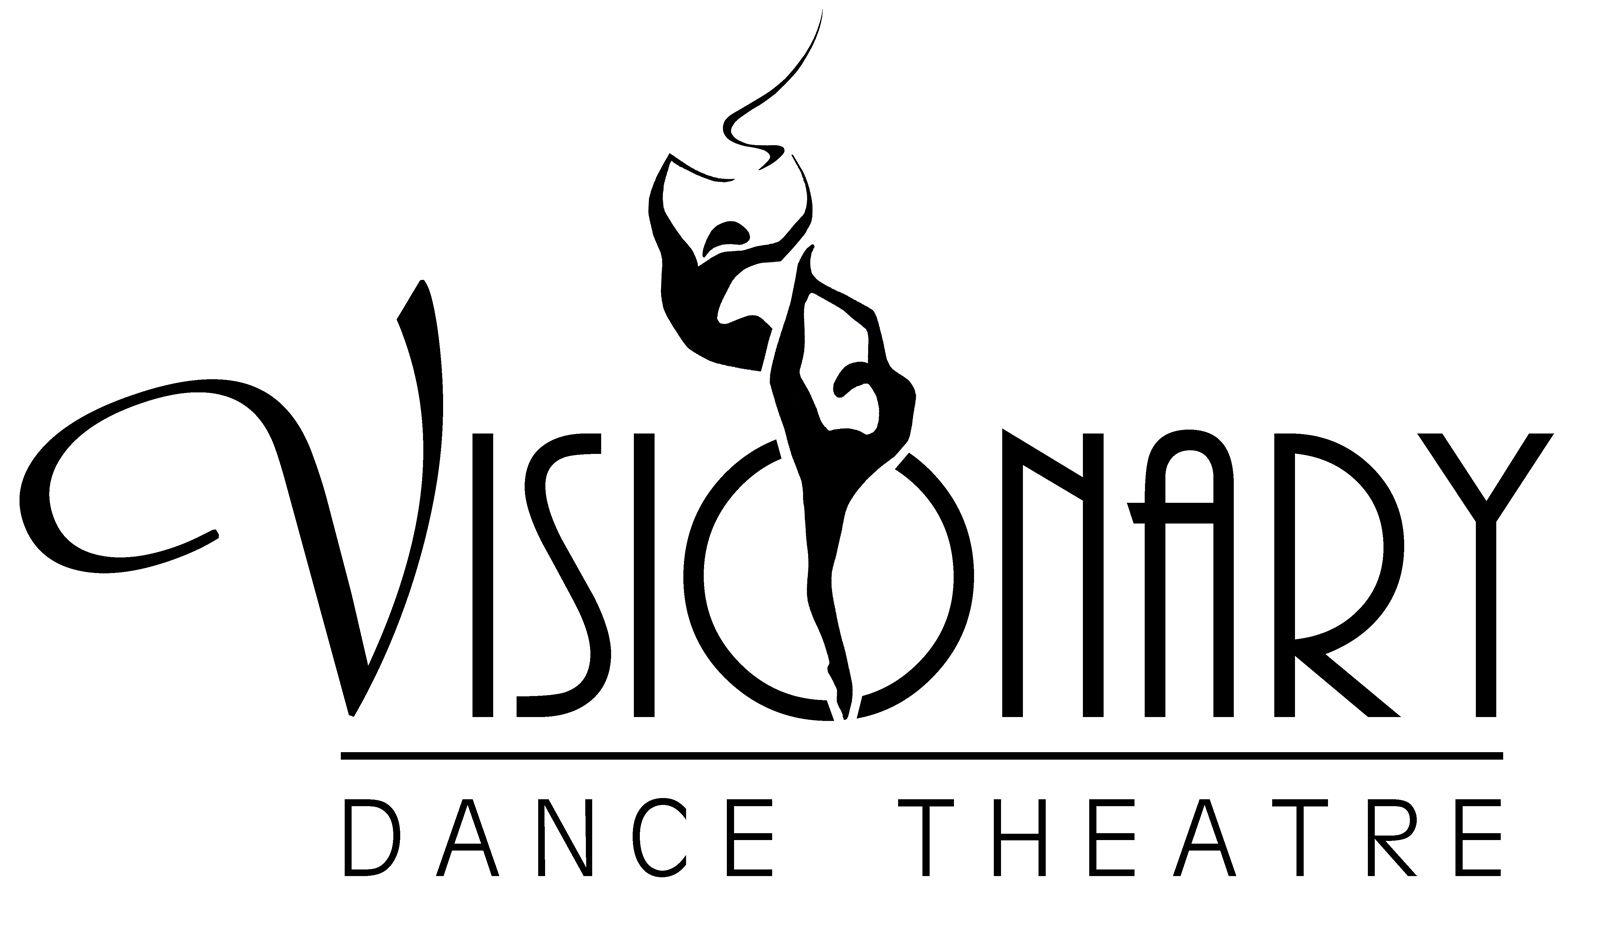 Visionary Dance Theatre Logo